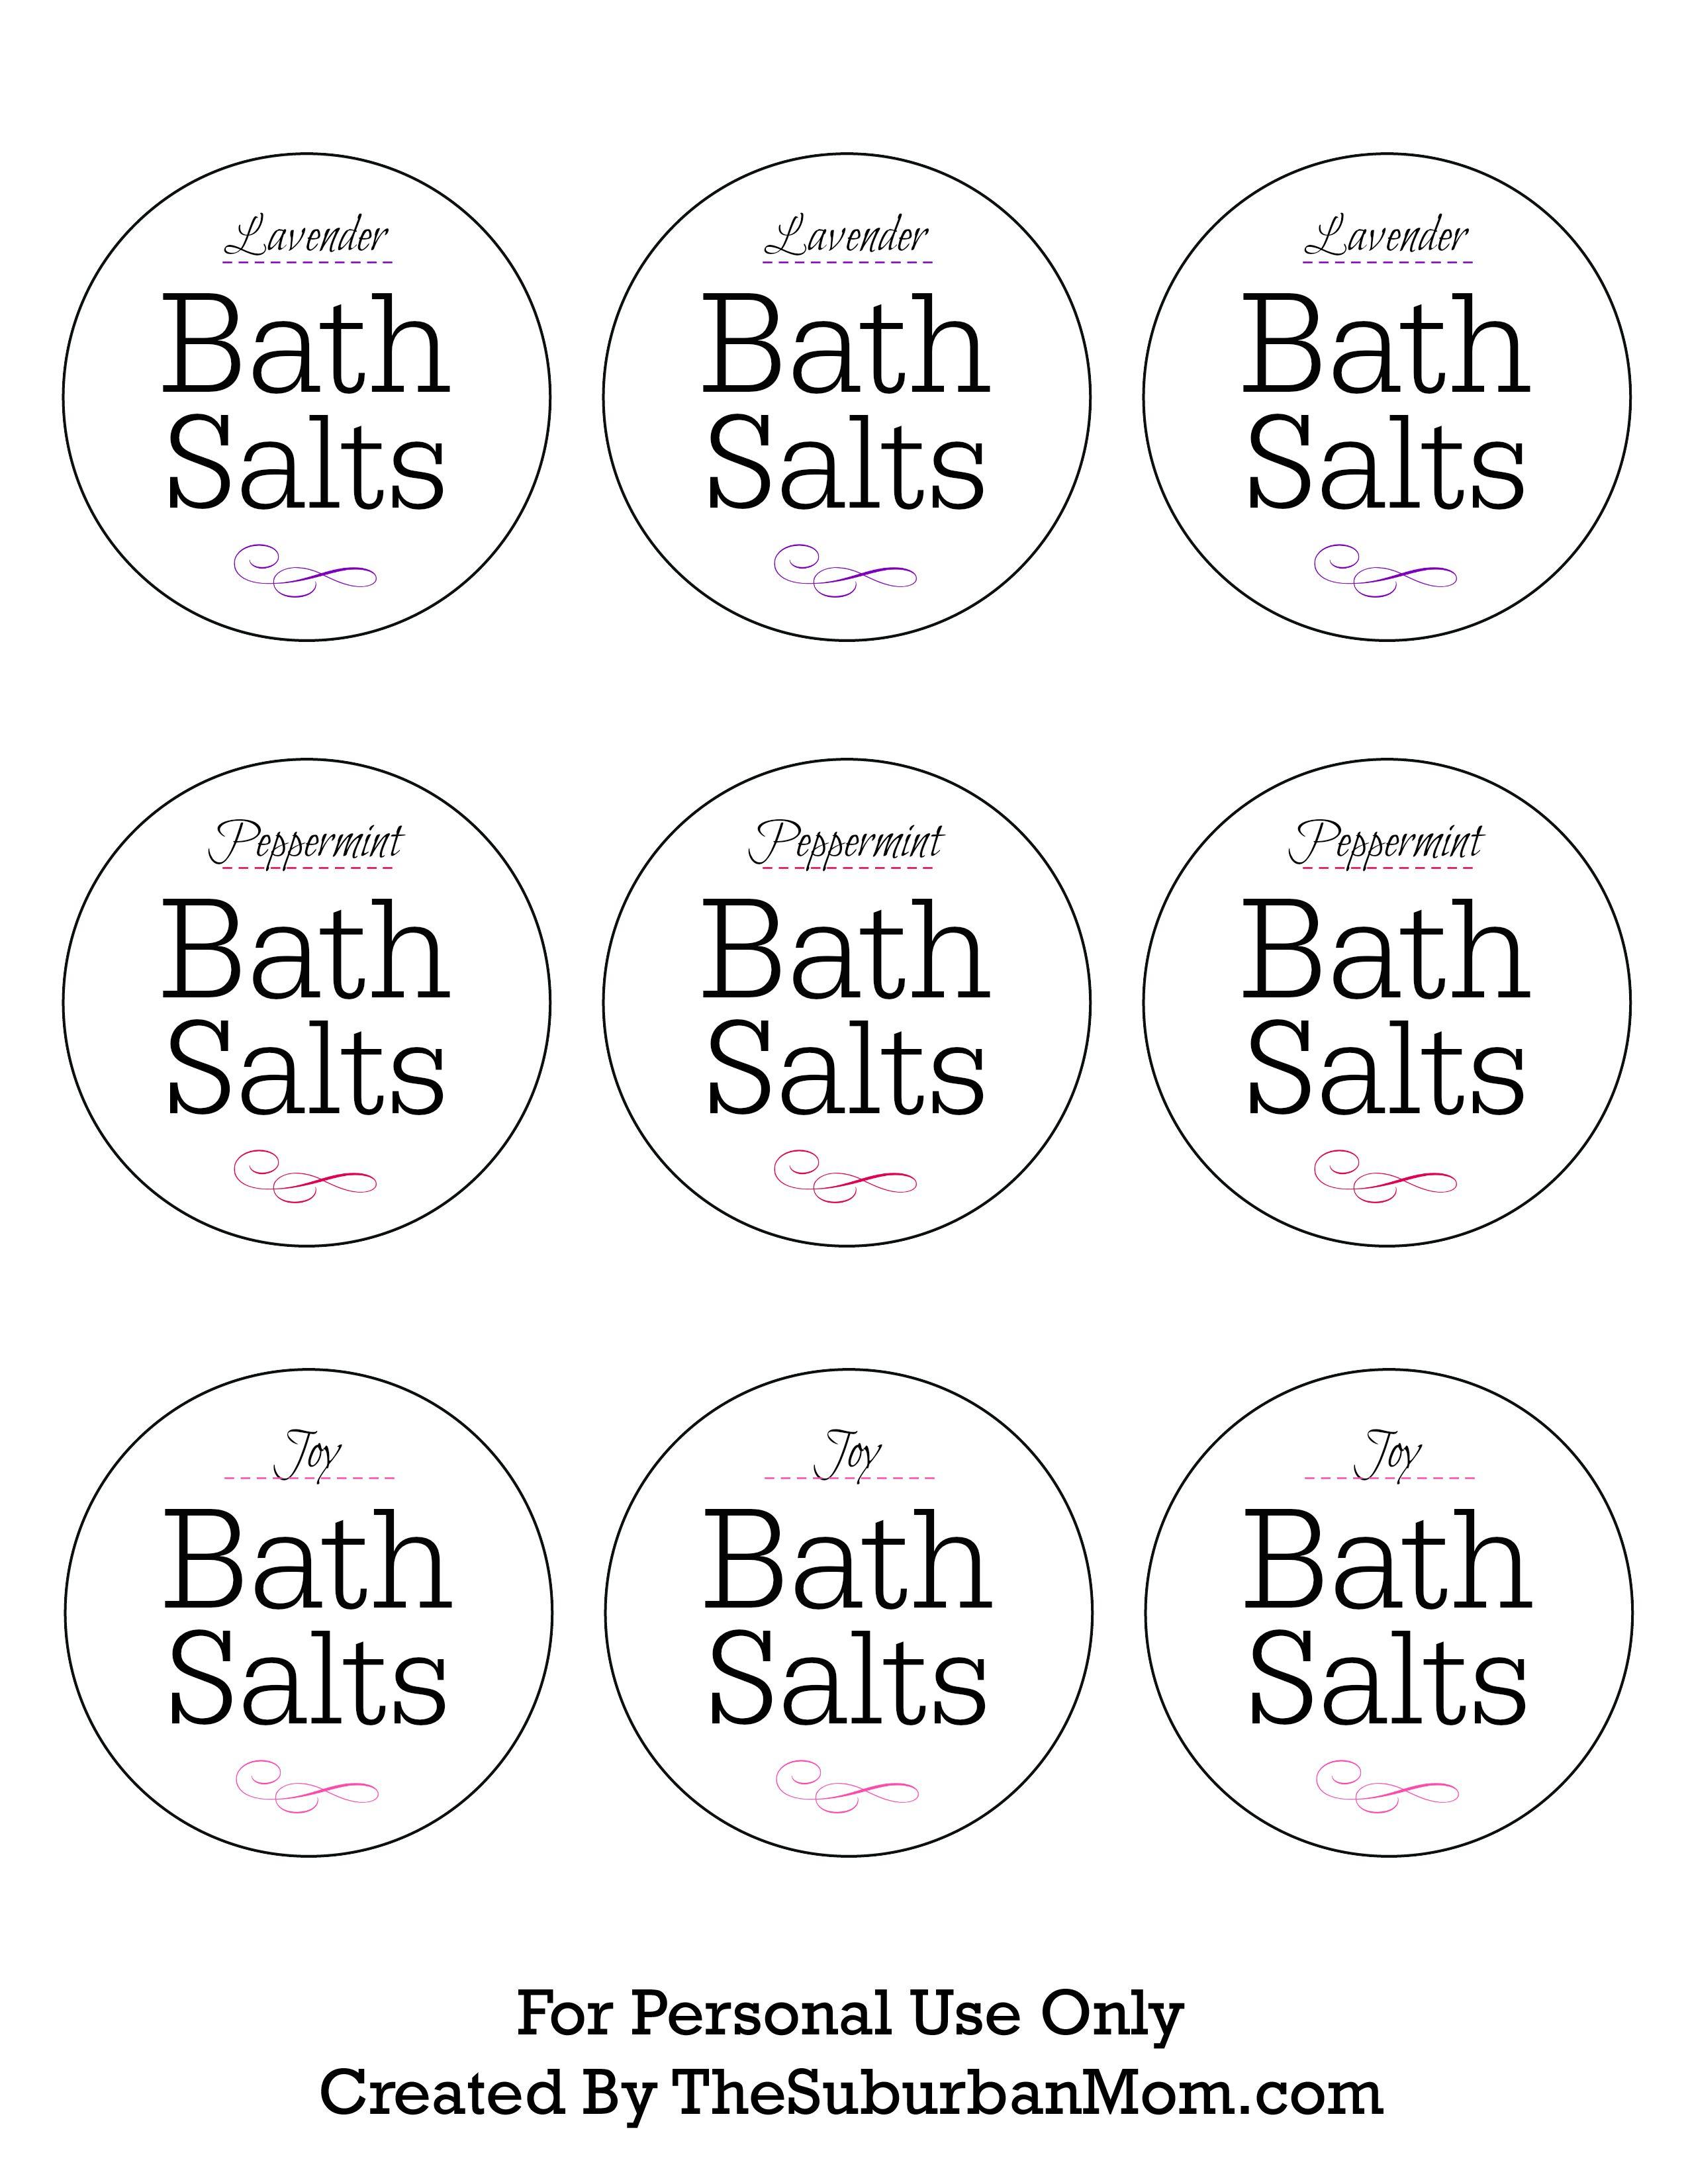 How To Make Lavender Bath Salts Printable Gift Tag Bath Salts Diy Bath Salt Labeling Bath Salts Recipe